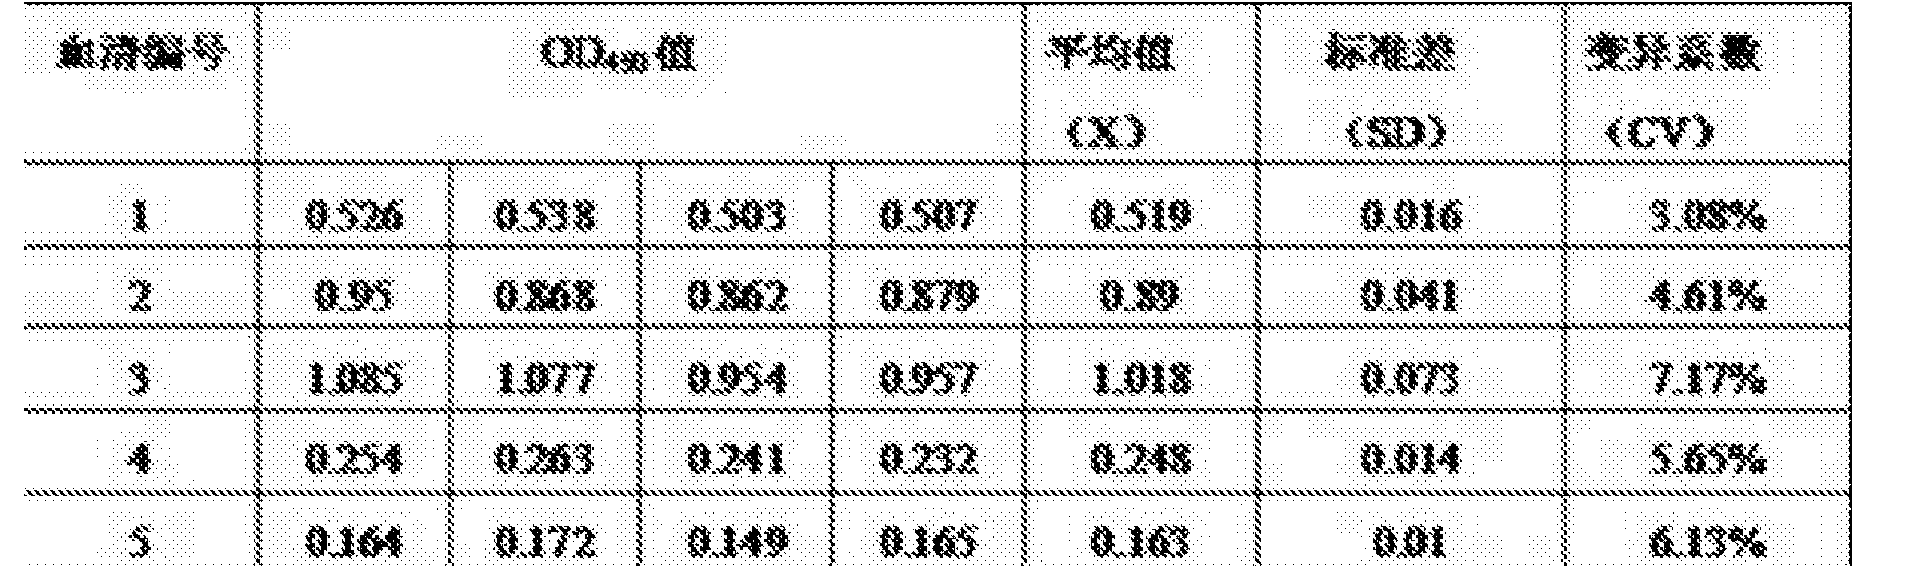 Figure CN106841611AD00052